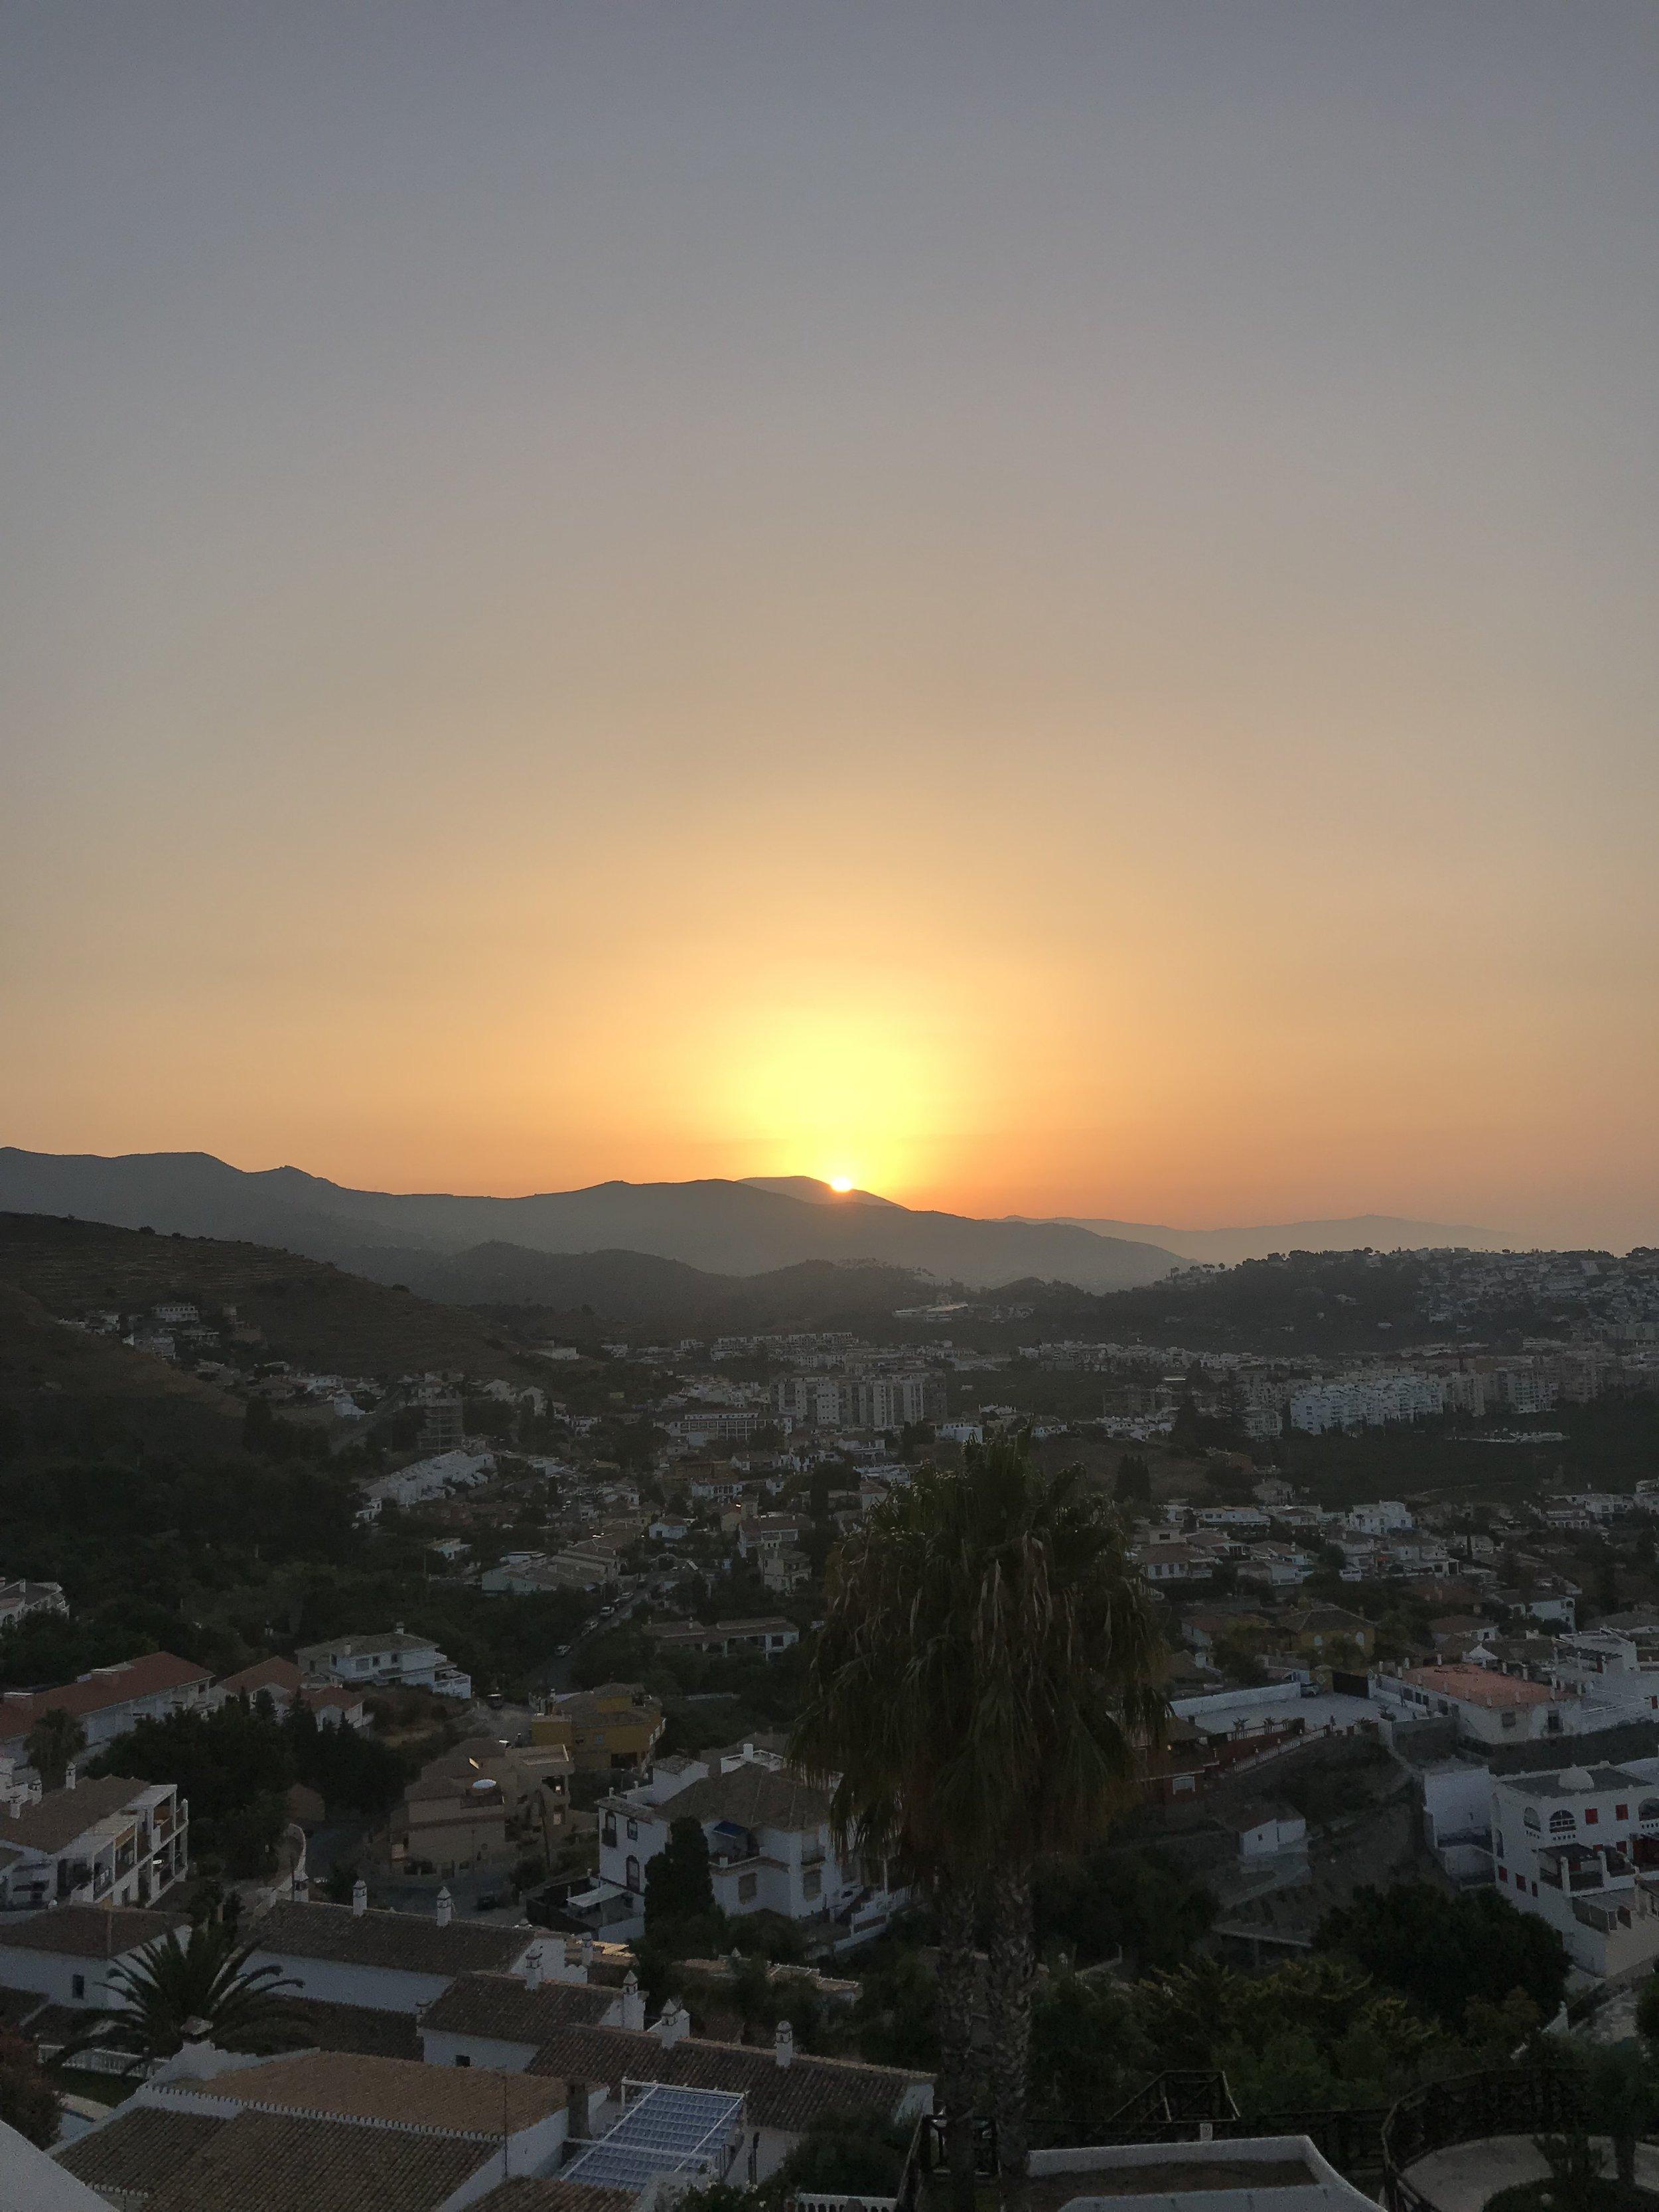 Rembering the beautiful mornings in Almuñecar